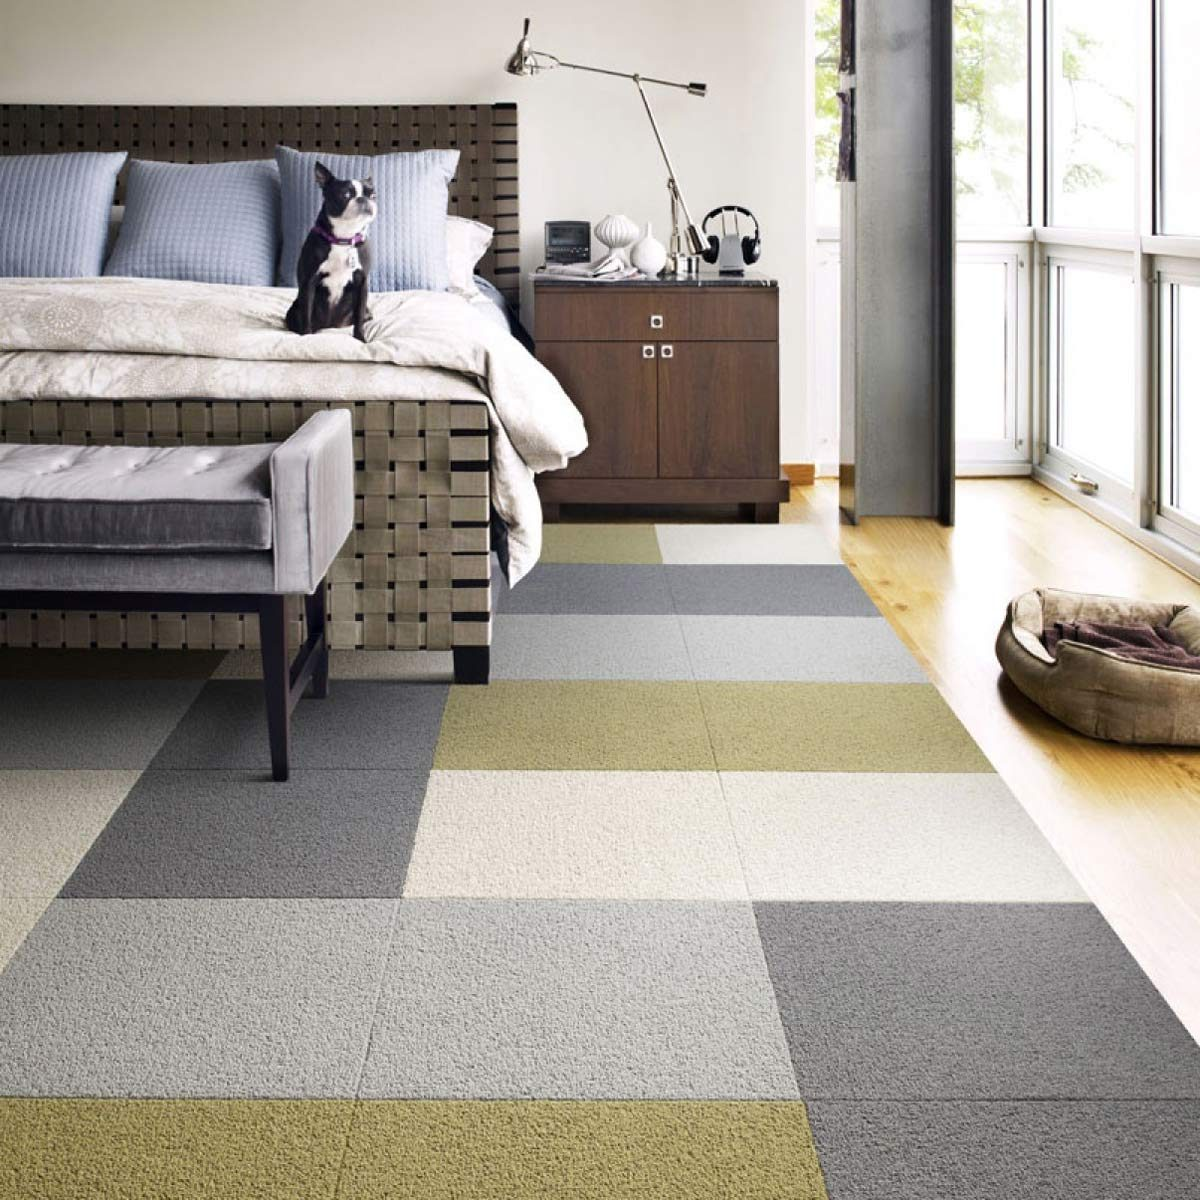 Carpet Tile Design Ideas